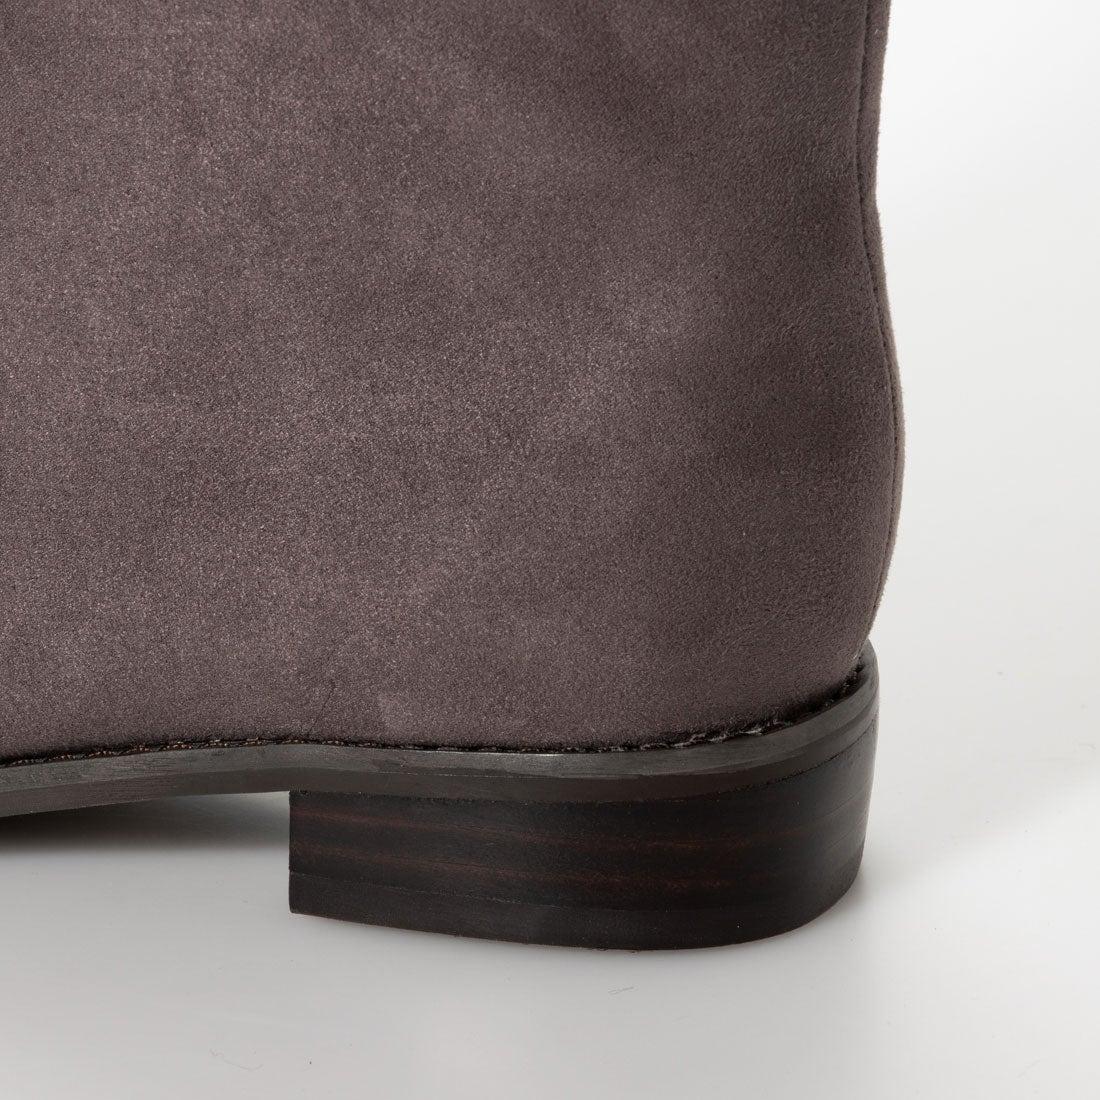 Fake Fur Short Boots [9113R]